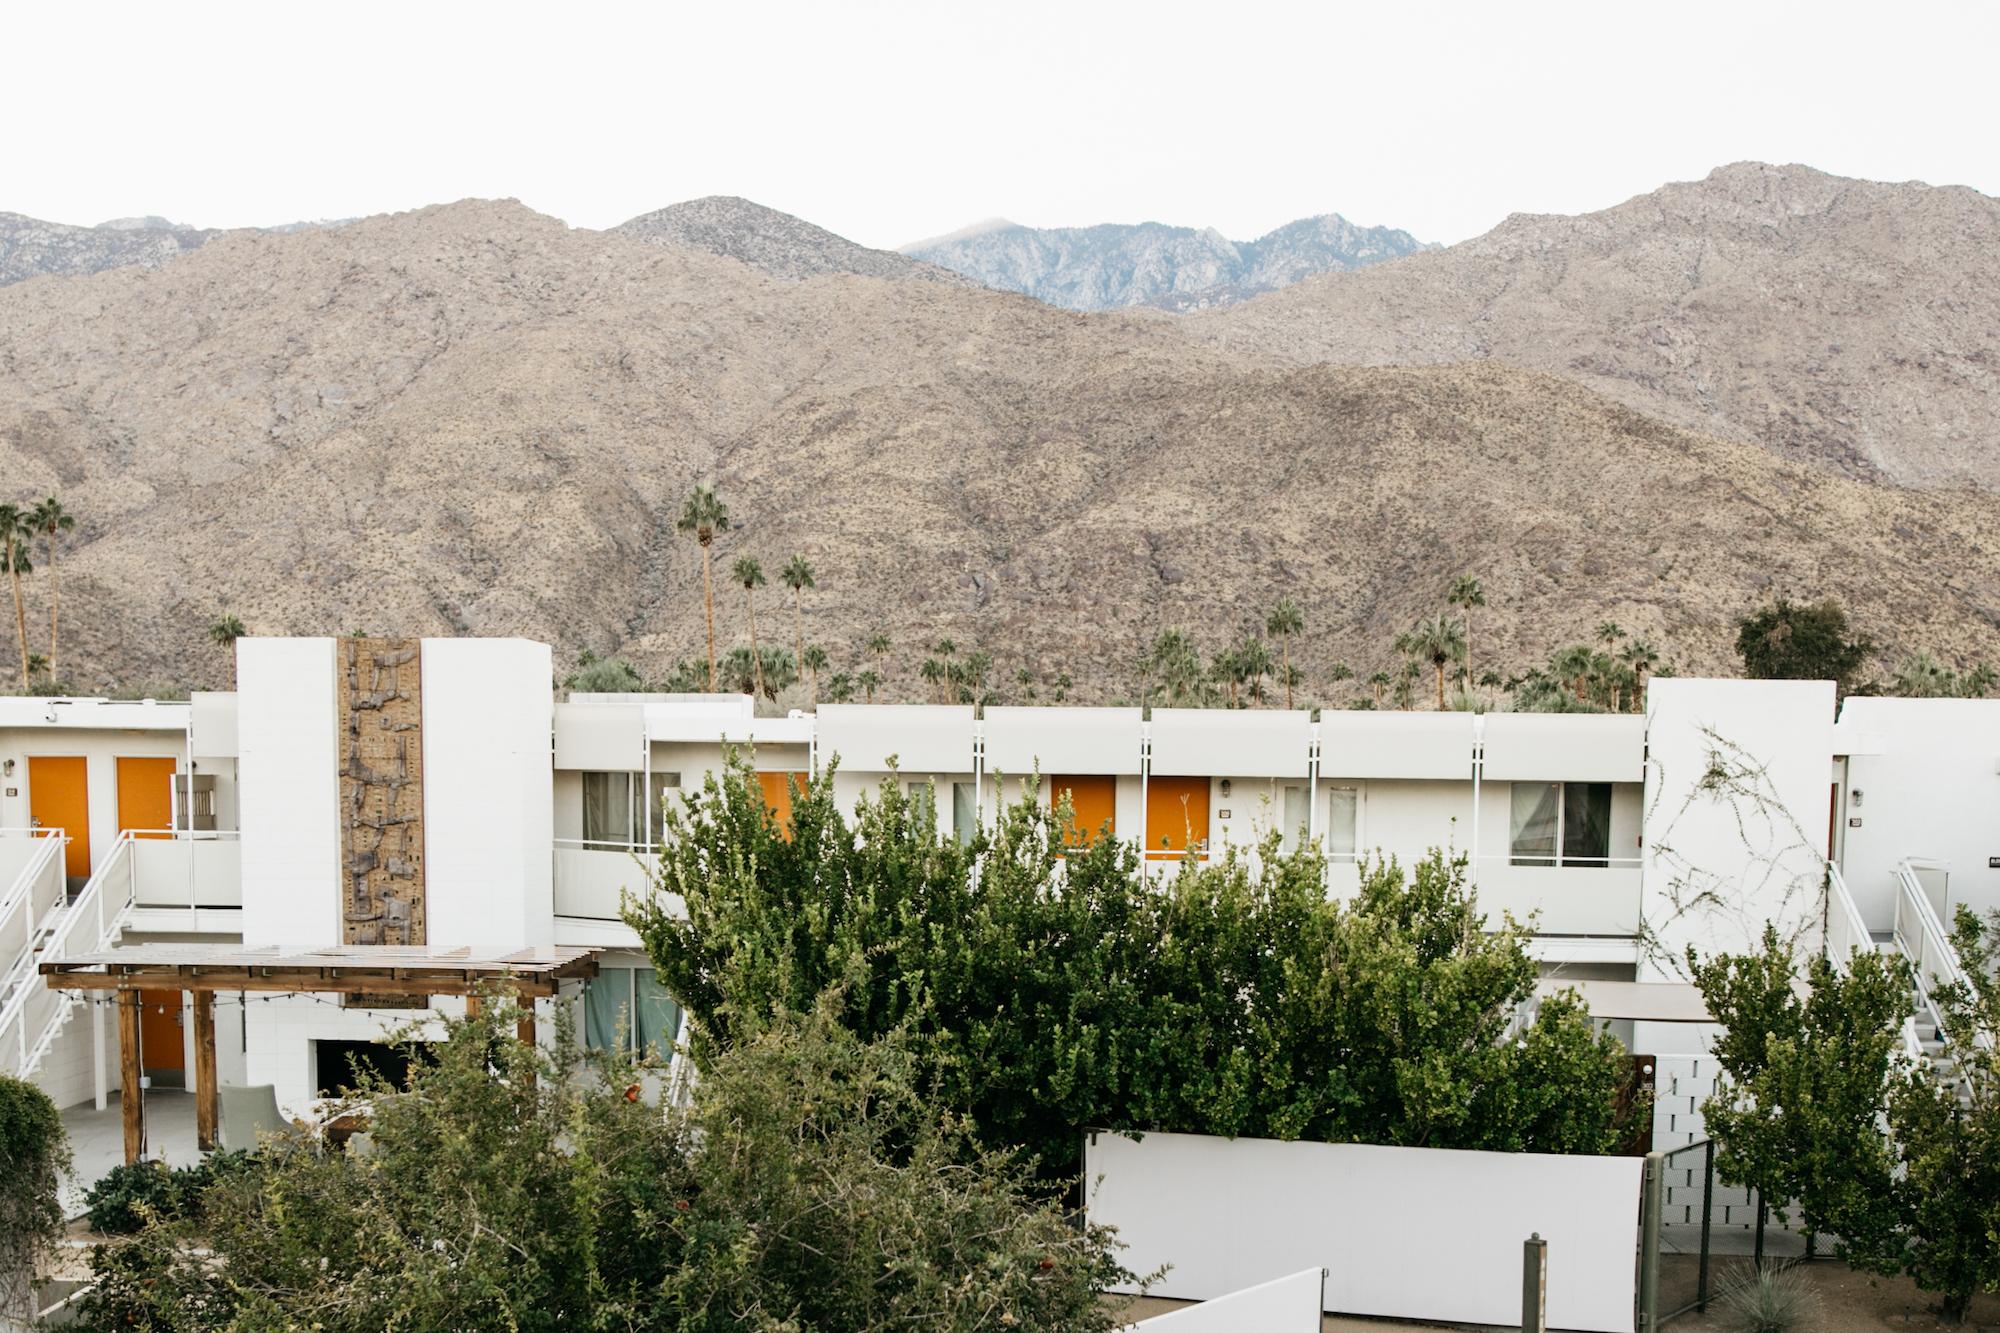 ace-hotel-palm-springs-wedding-photographer658.jpg